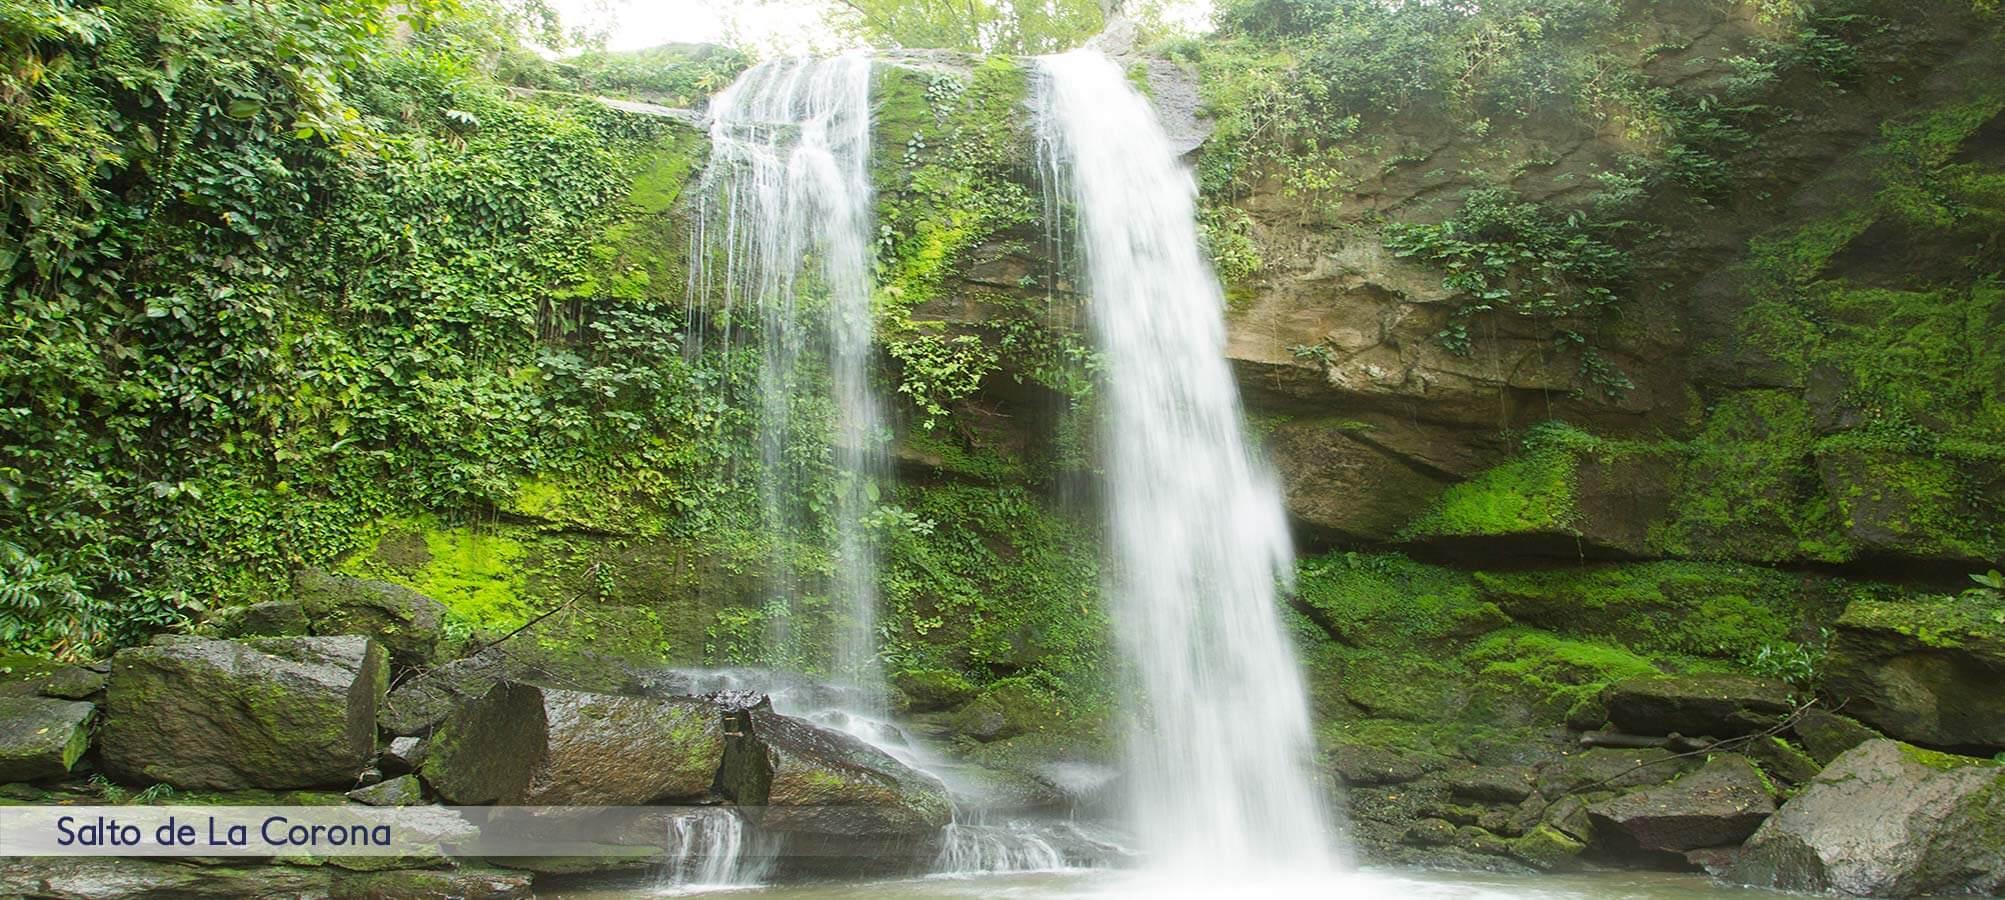 Comunida-la-corona-caminatas-mas-cascadas